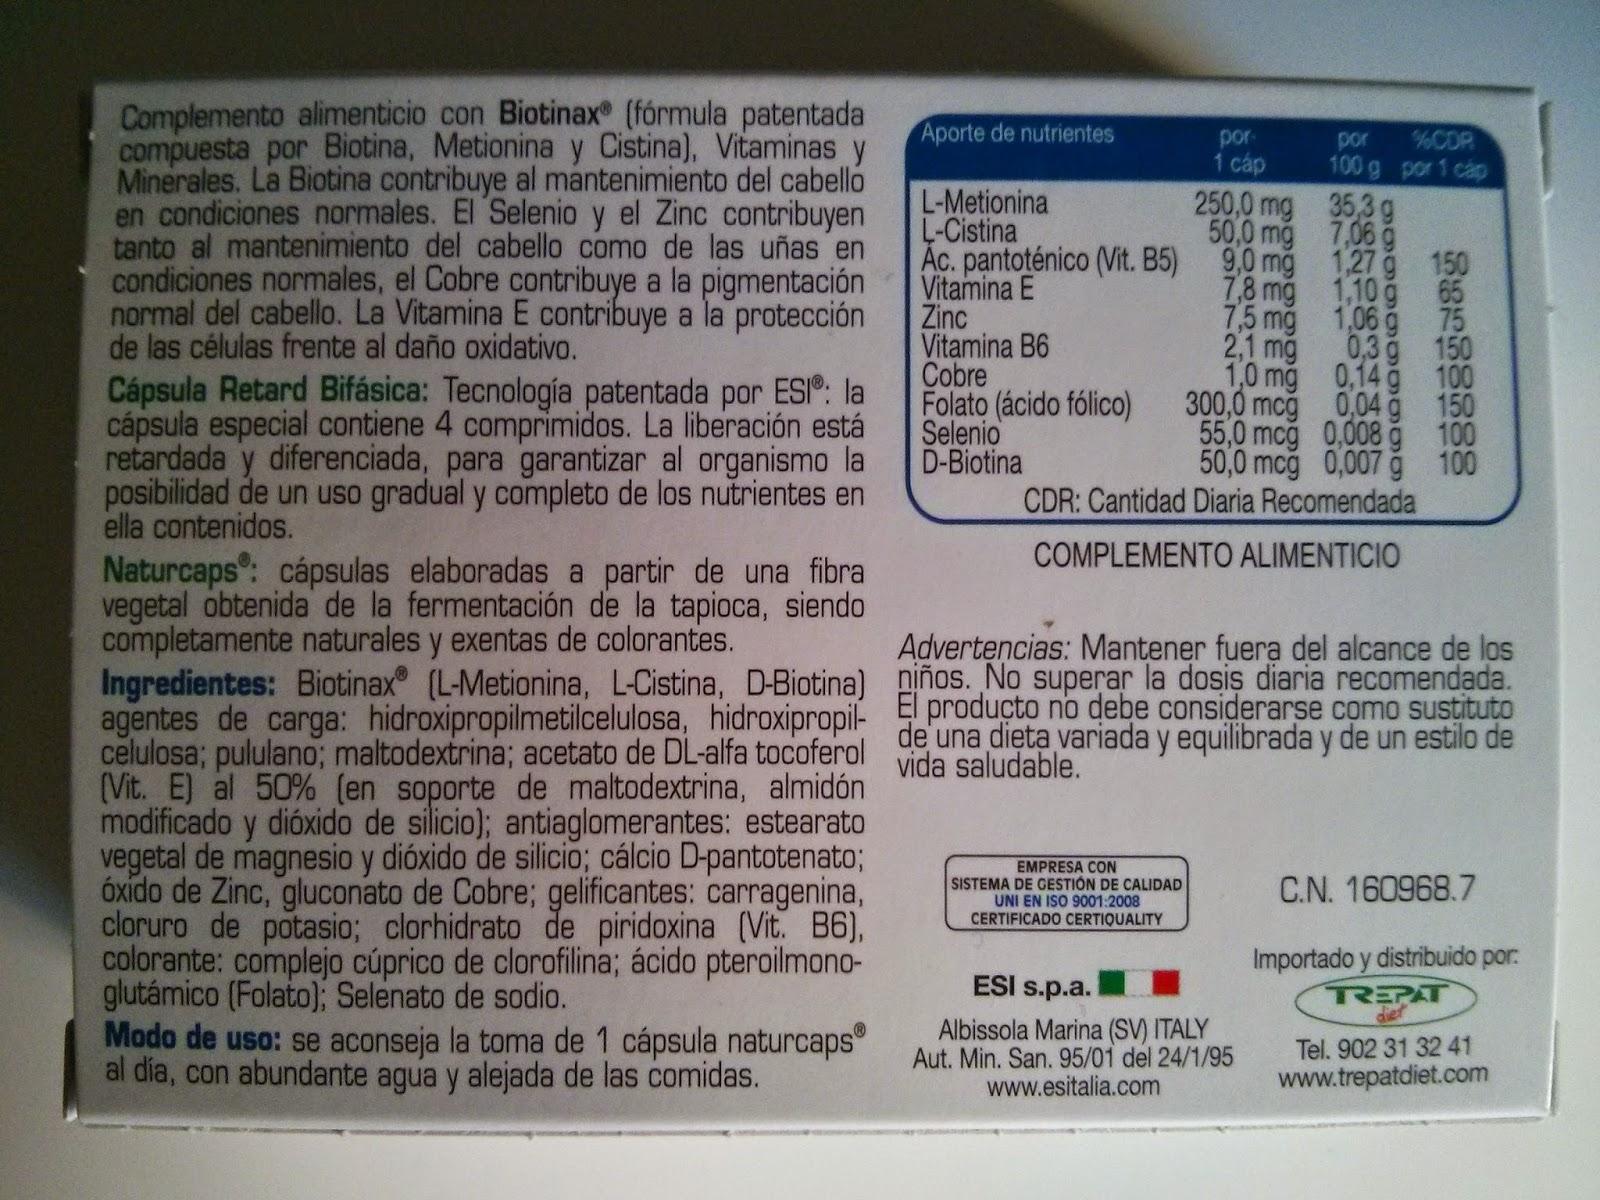 VipandSmart 3 productos capilares- Rigenforte